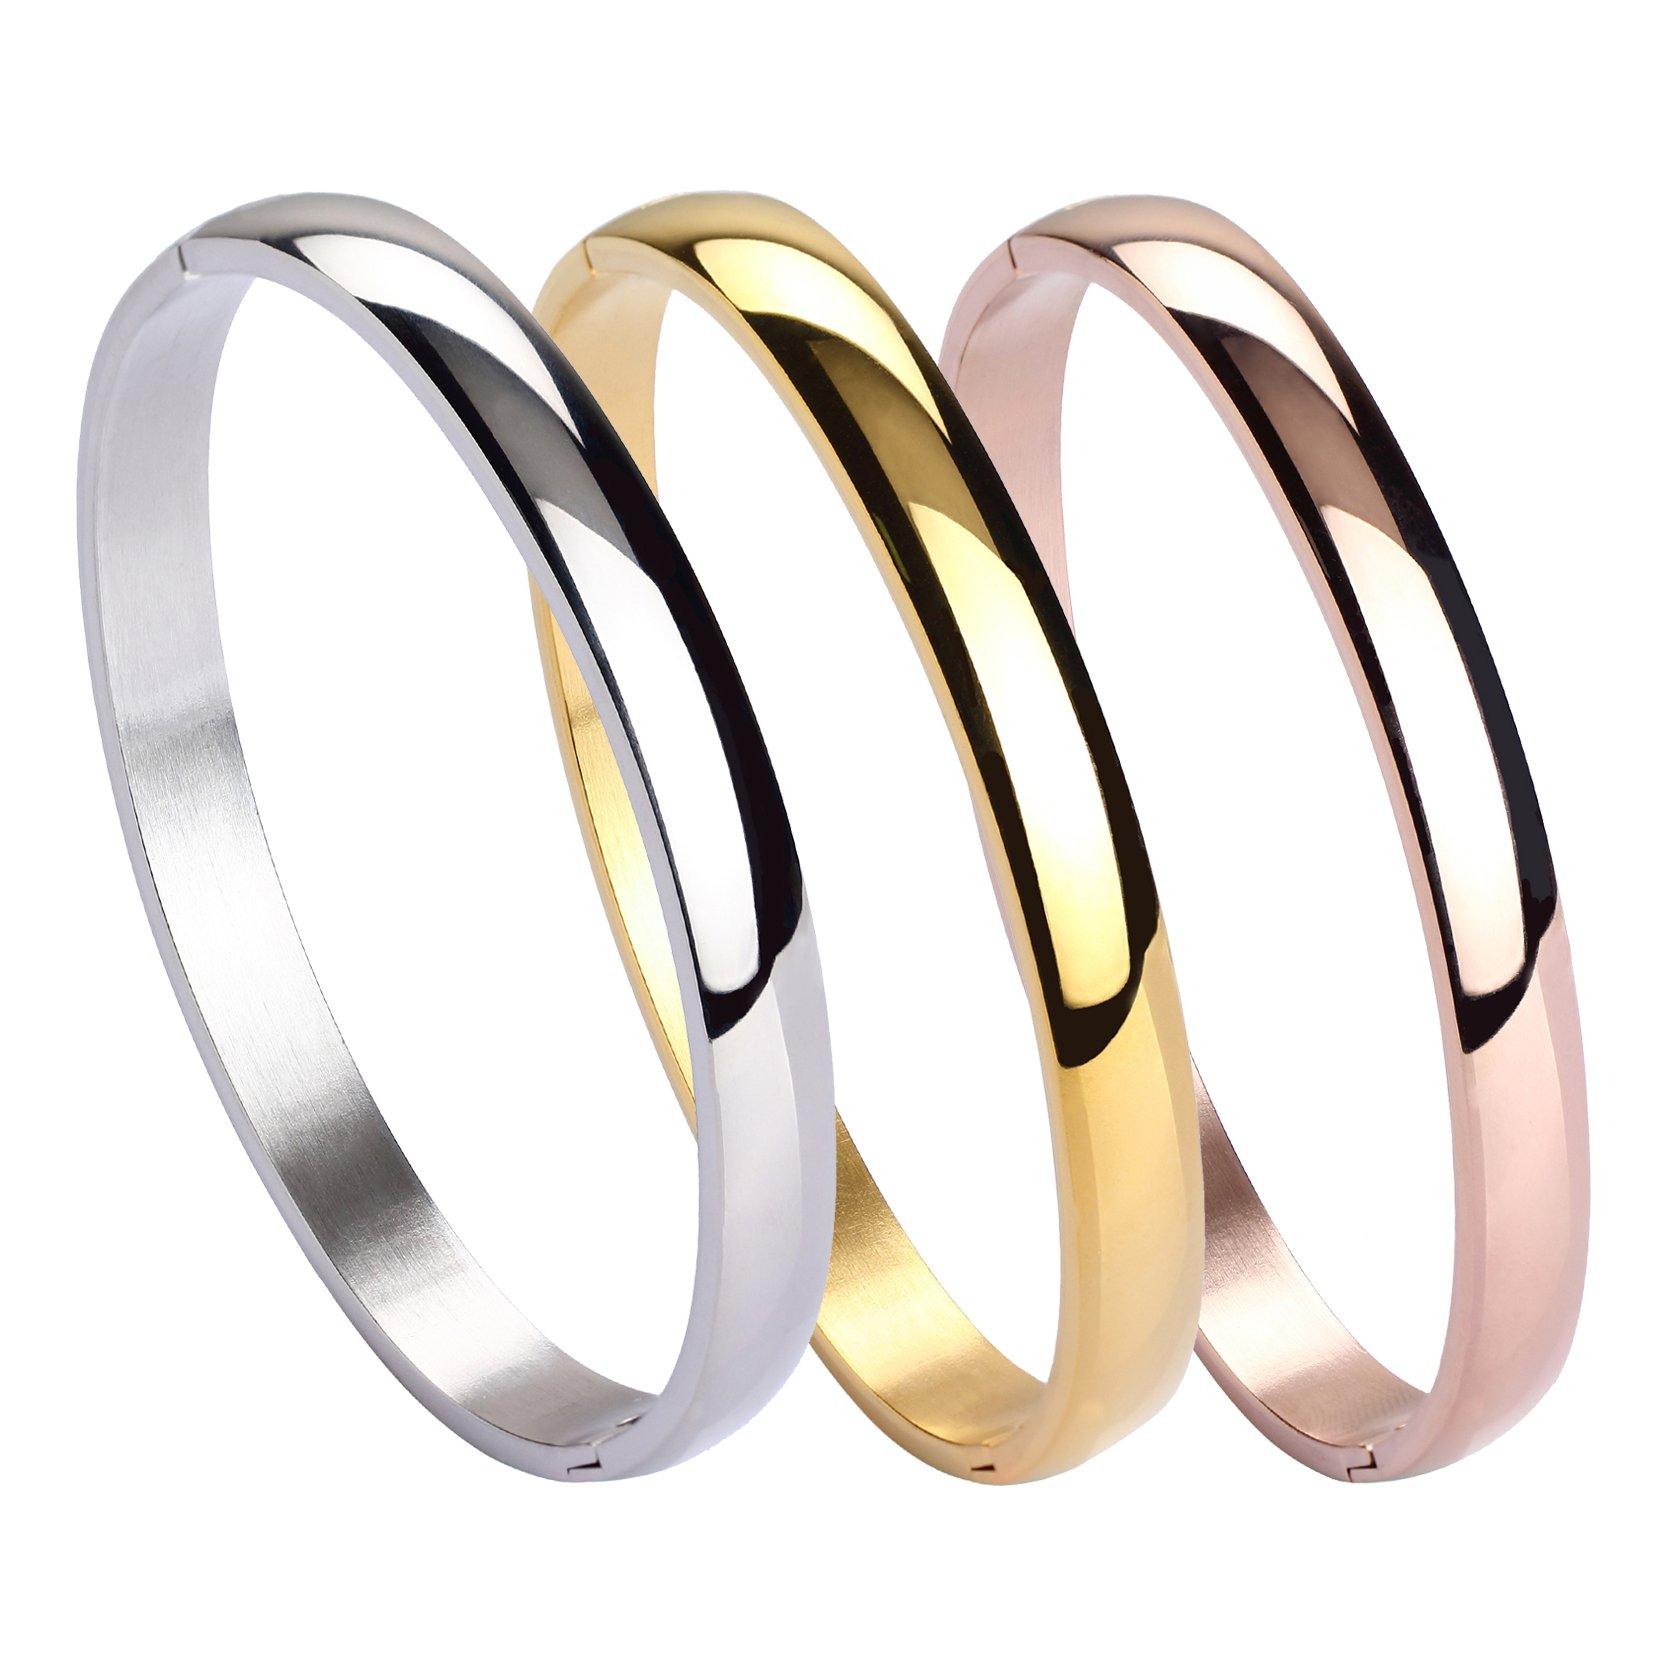 JUSNOVA 3Pcs Stainless Steel Bangle Brecelet for Women Girls Plain Polished Finish Cuff Bracelet 7.3 inches Silver/Gold/Rose Gold Tone